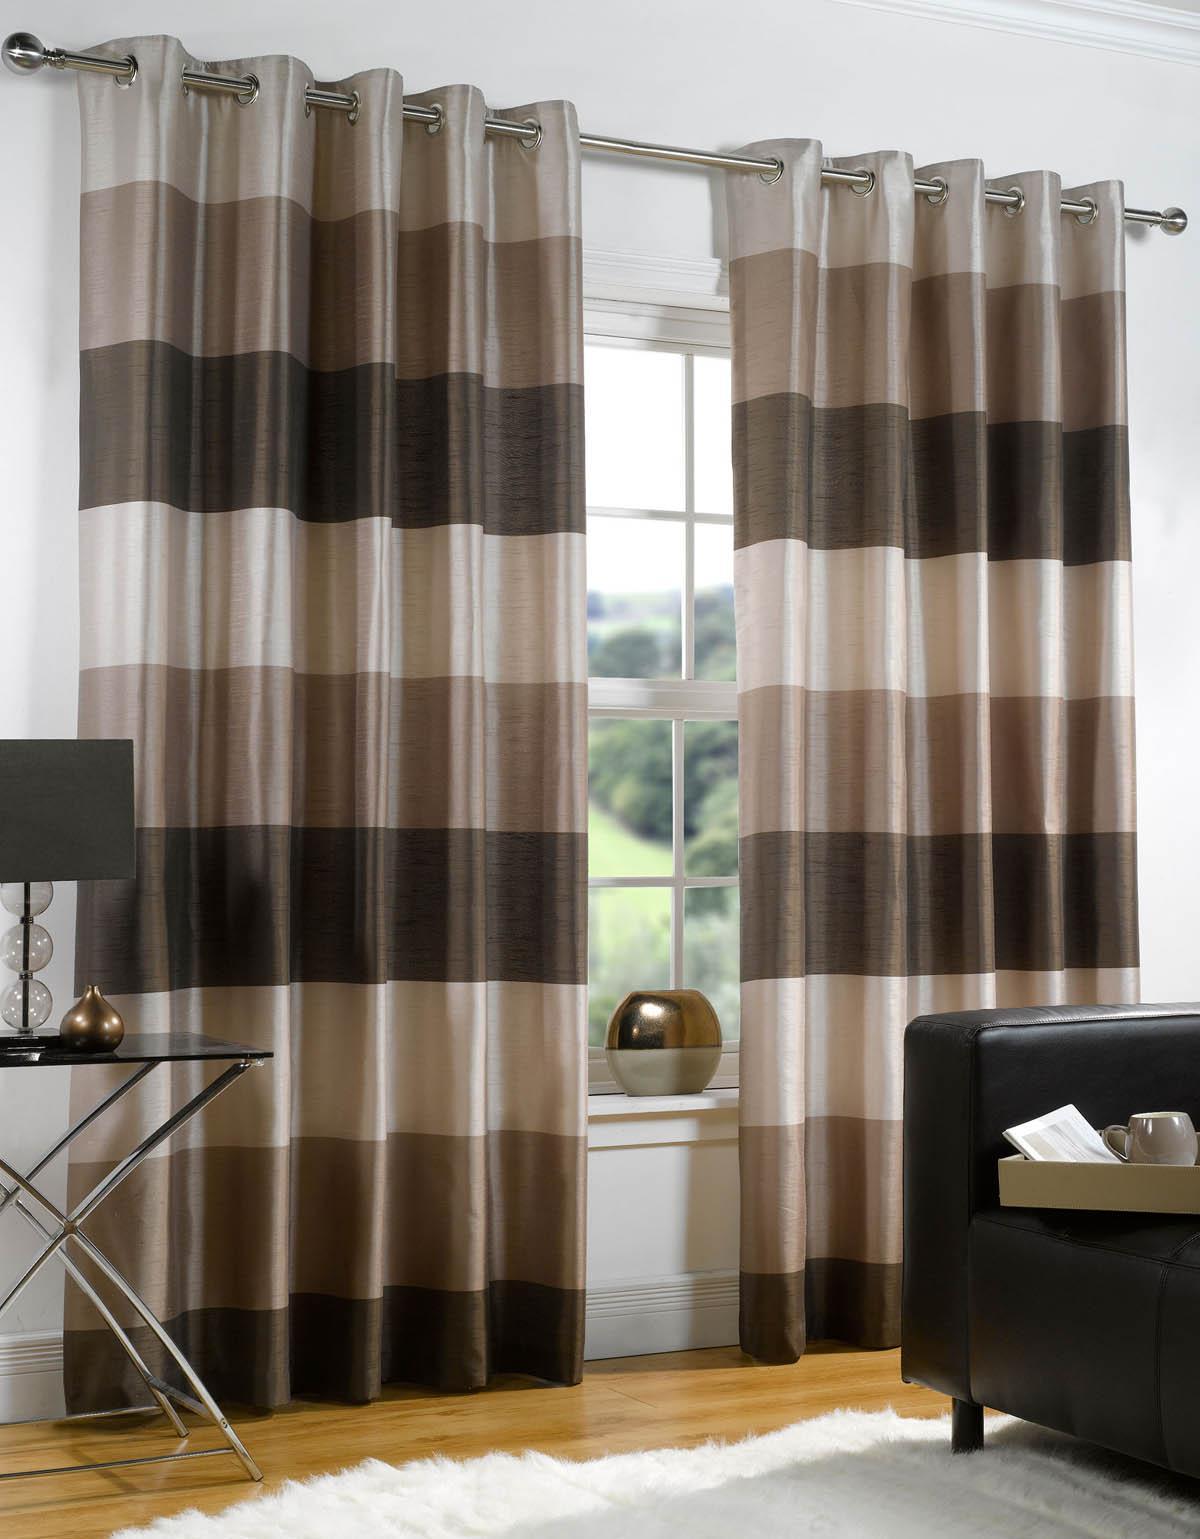 Rio-Chocolate 20+ Hottest Curtain Design Ideas for 2020